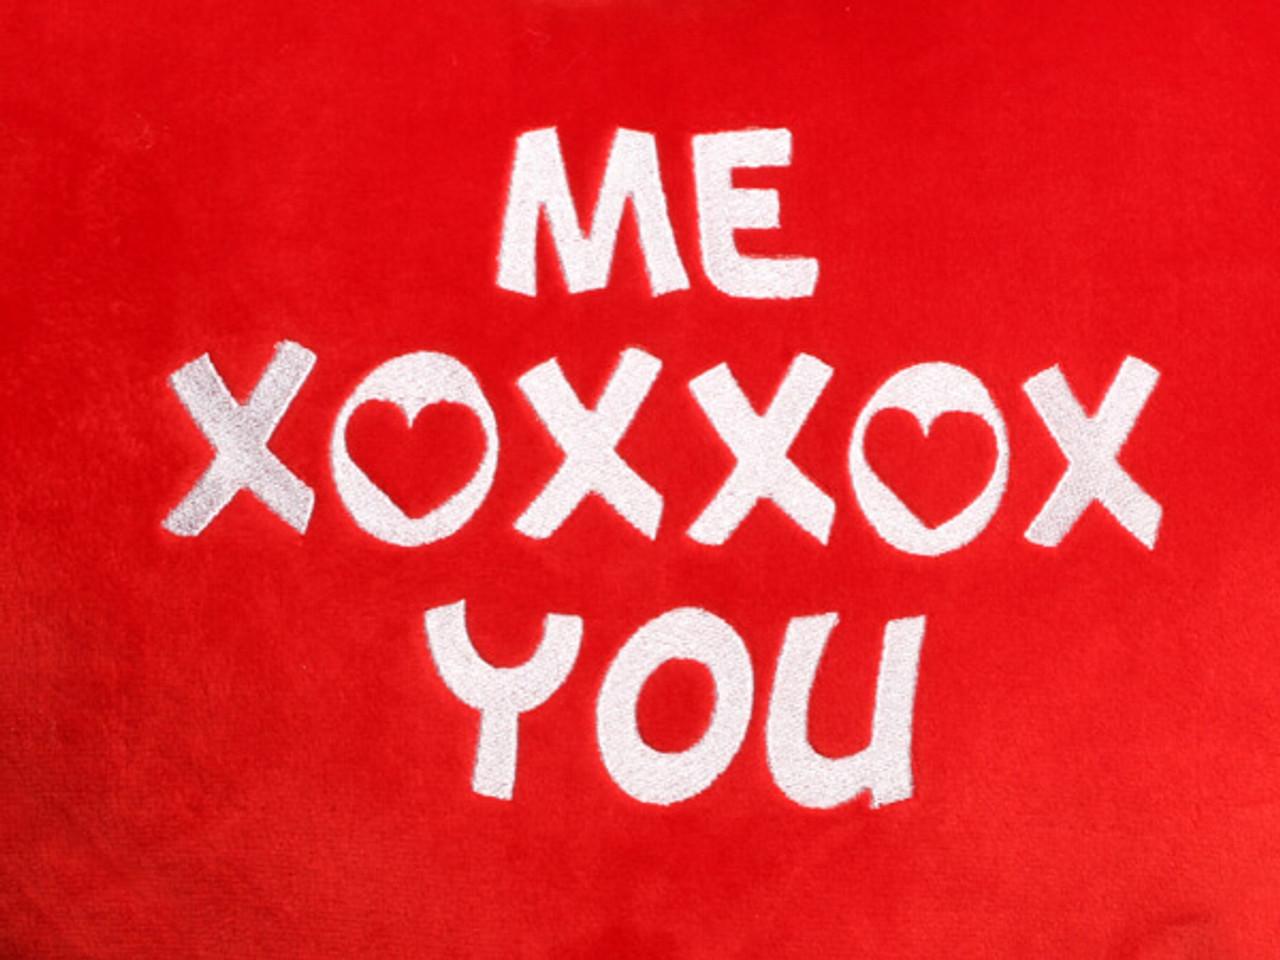 Me XOXXOX You Heart Design(Close Up)